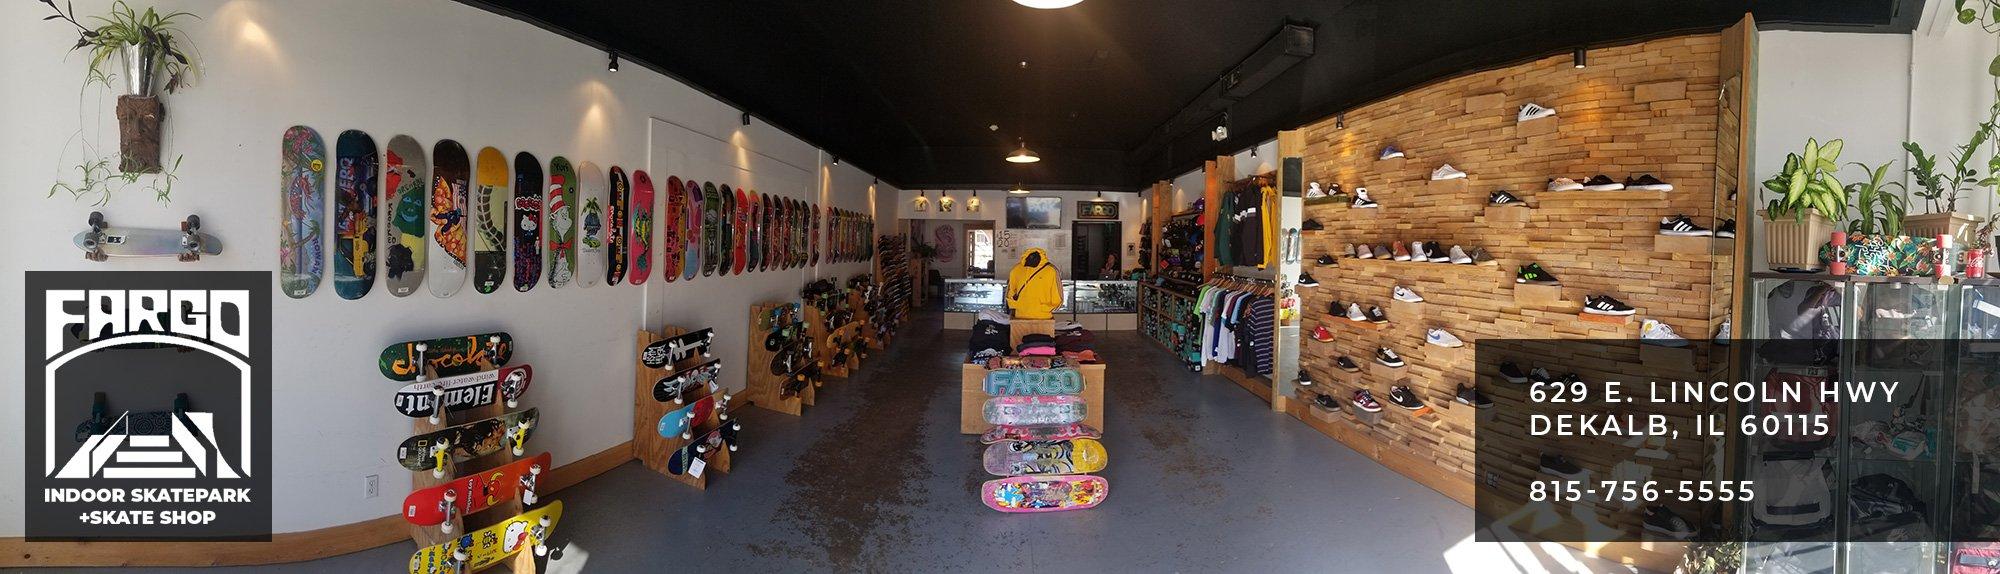 Fargo Skate Shop